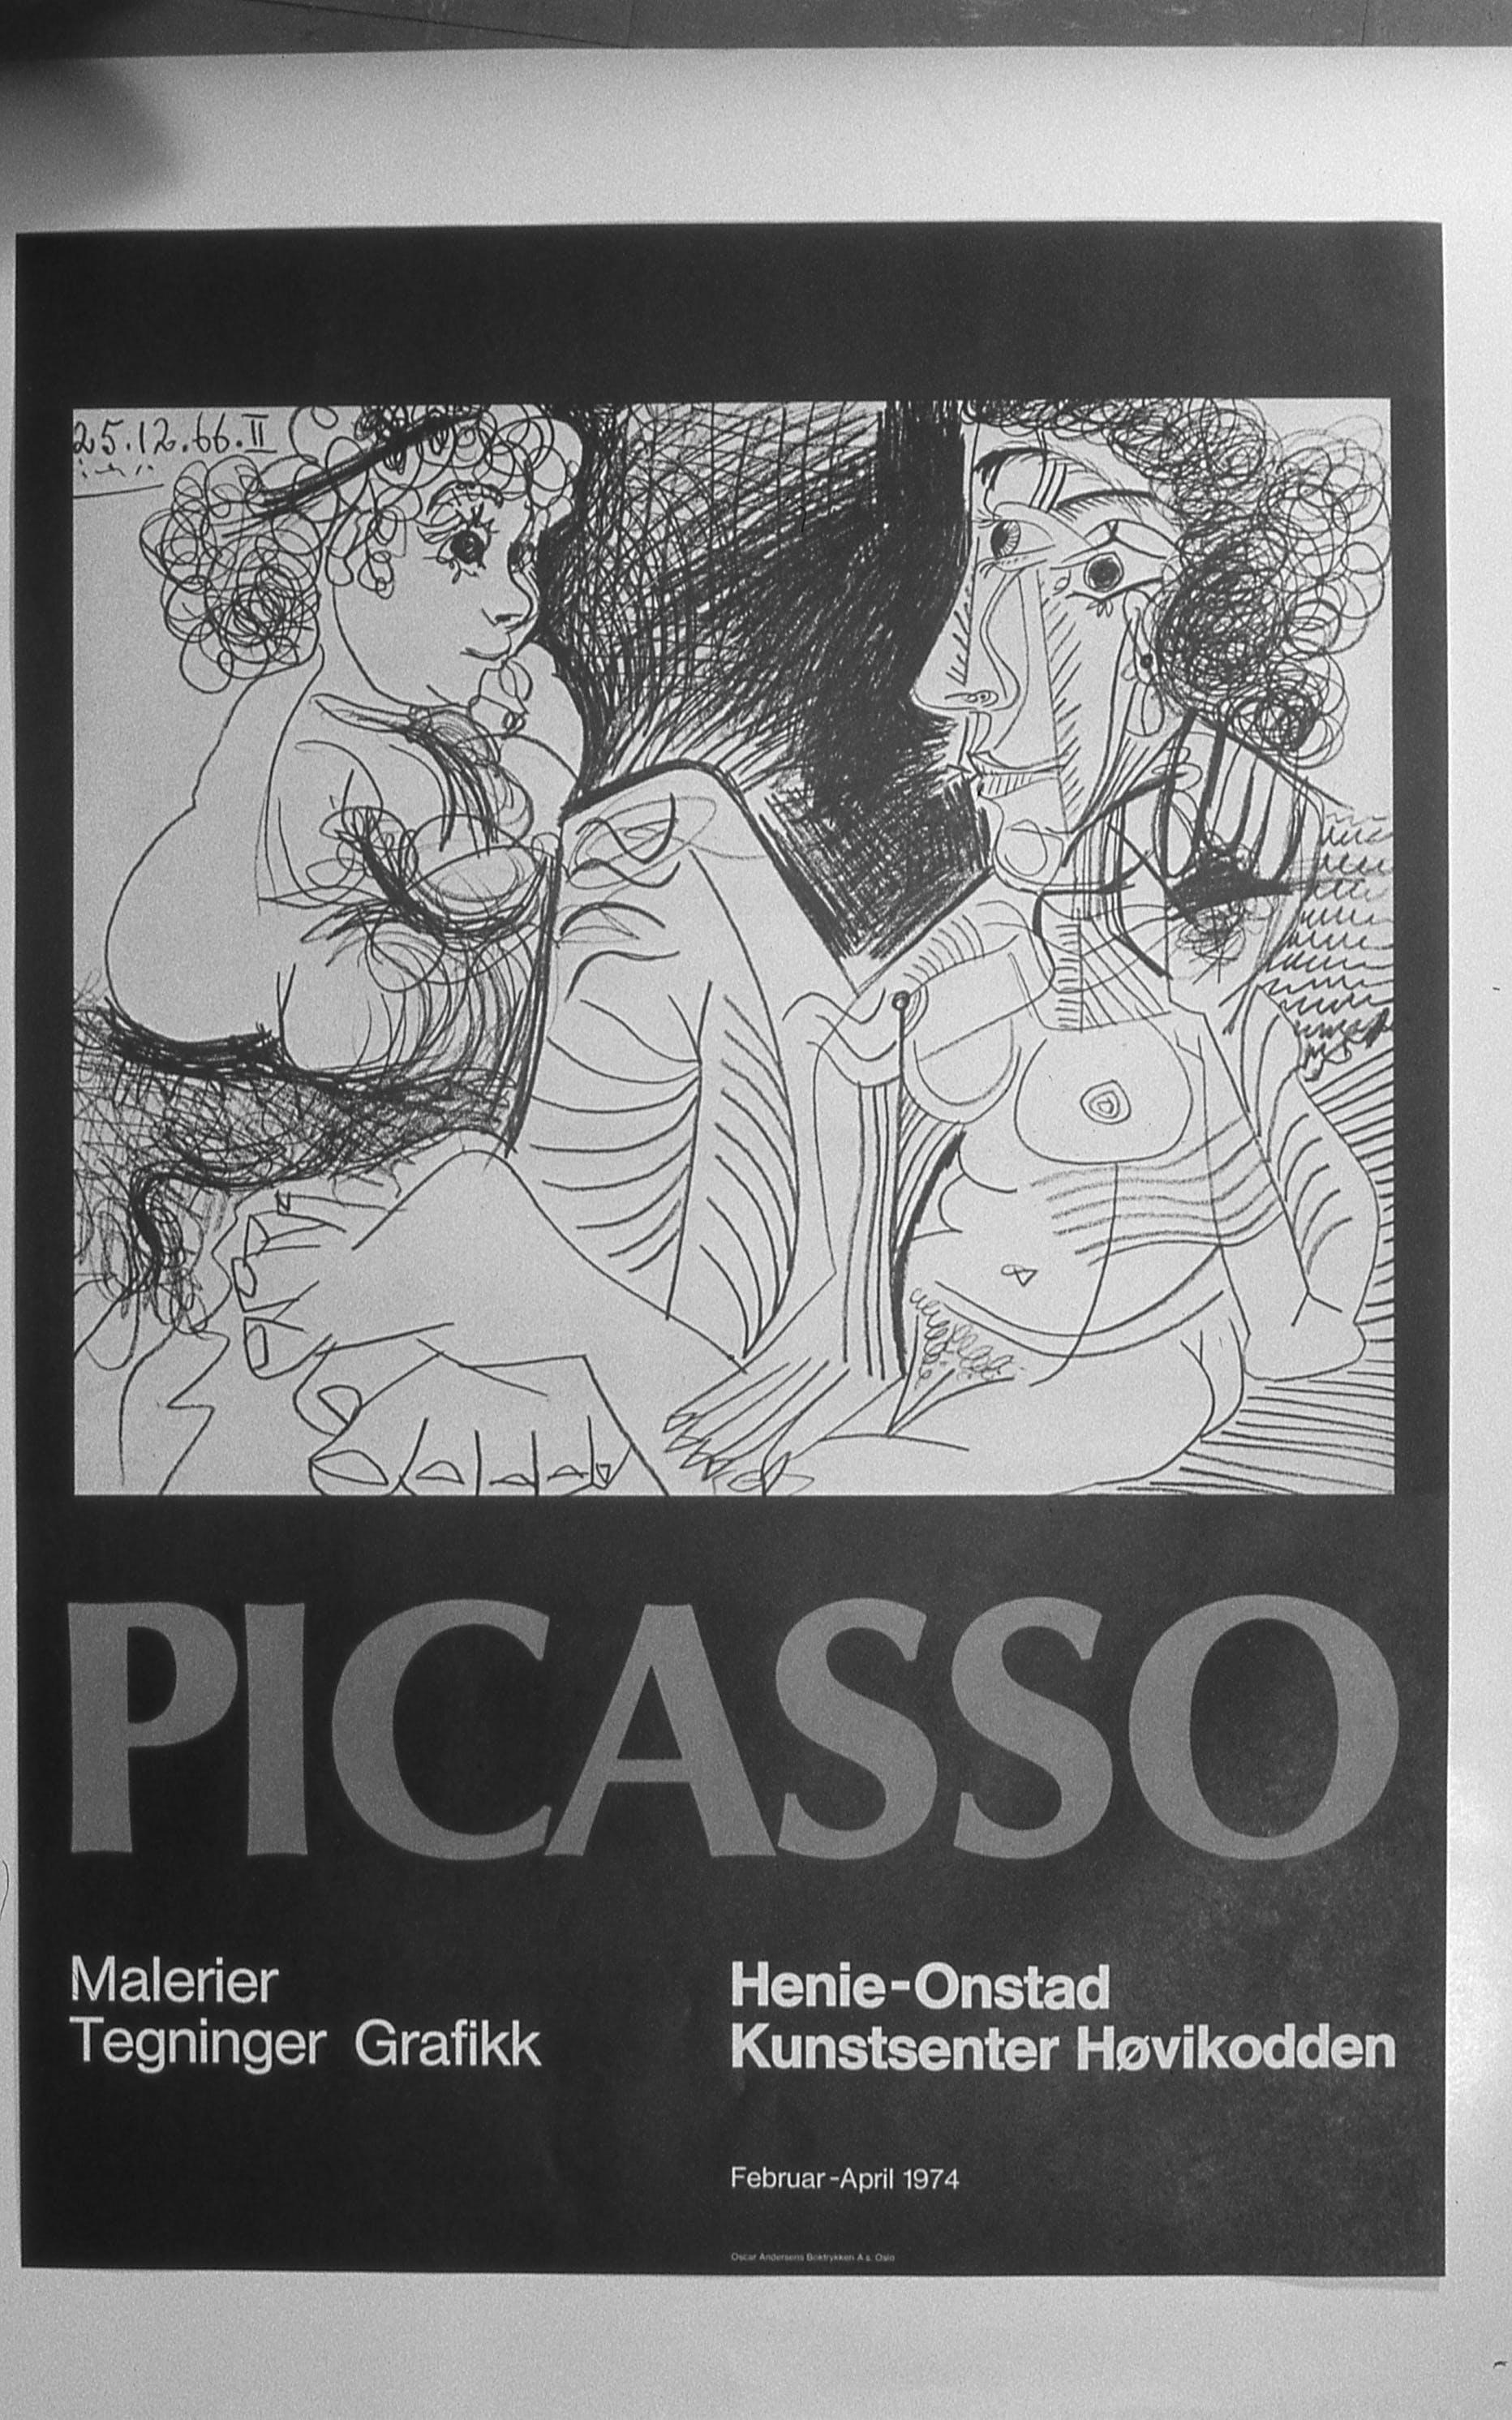 Picasso002